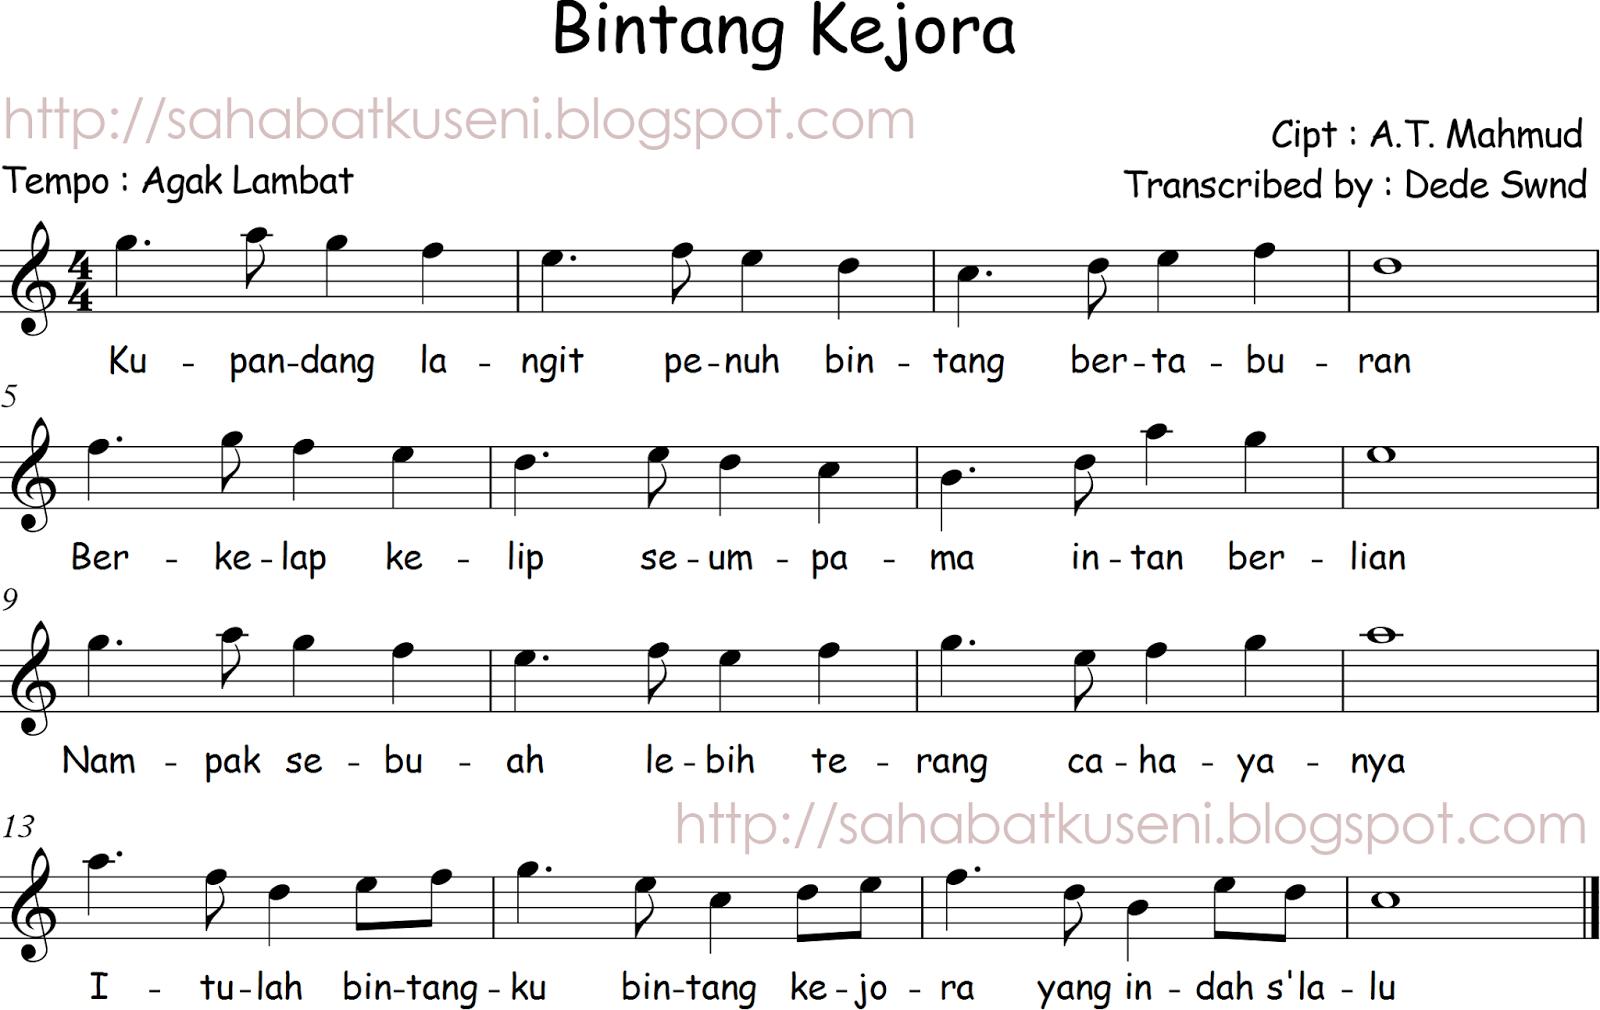 lagu anak-anak Bintang Kejora - Sahabatku Seni